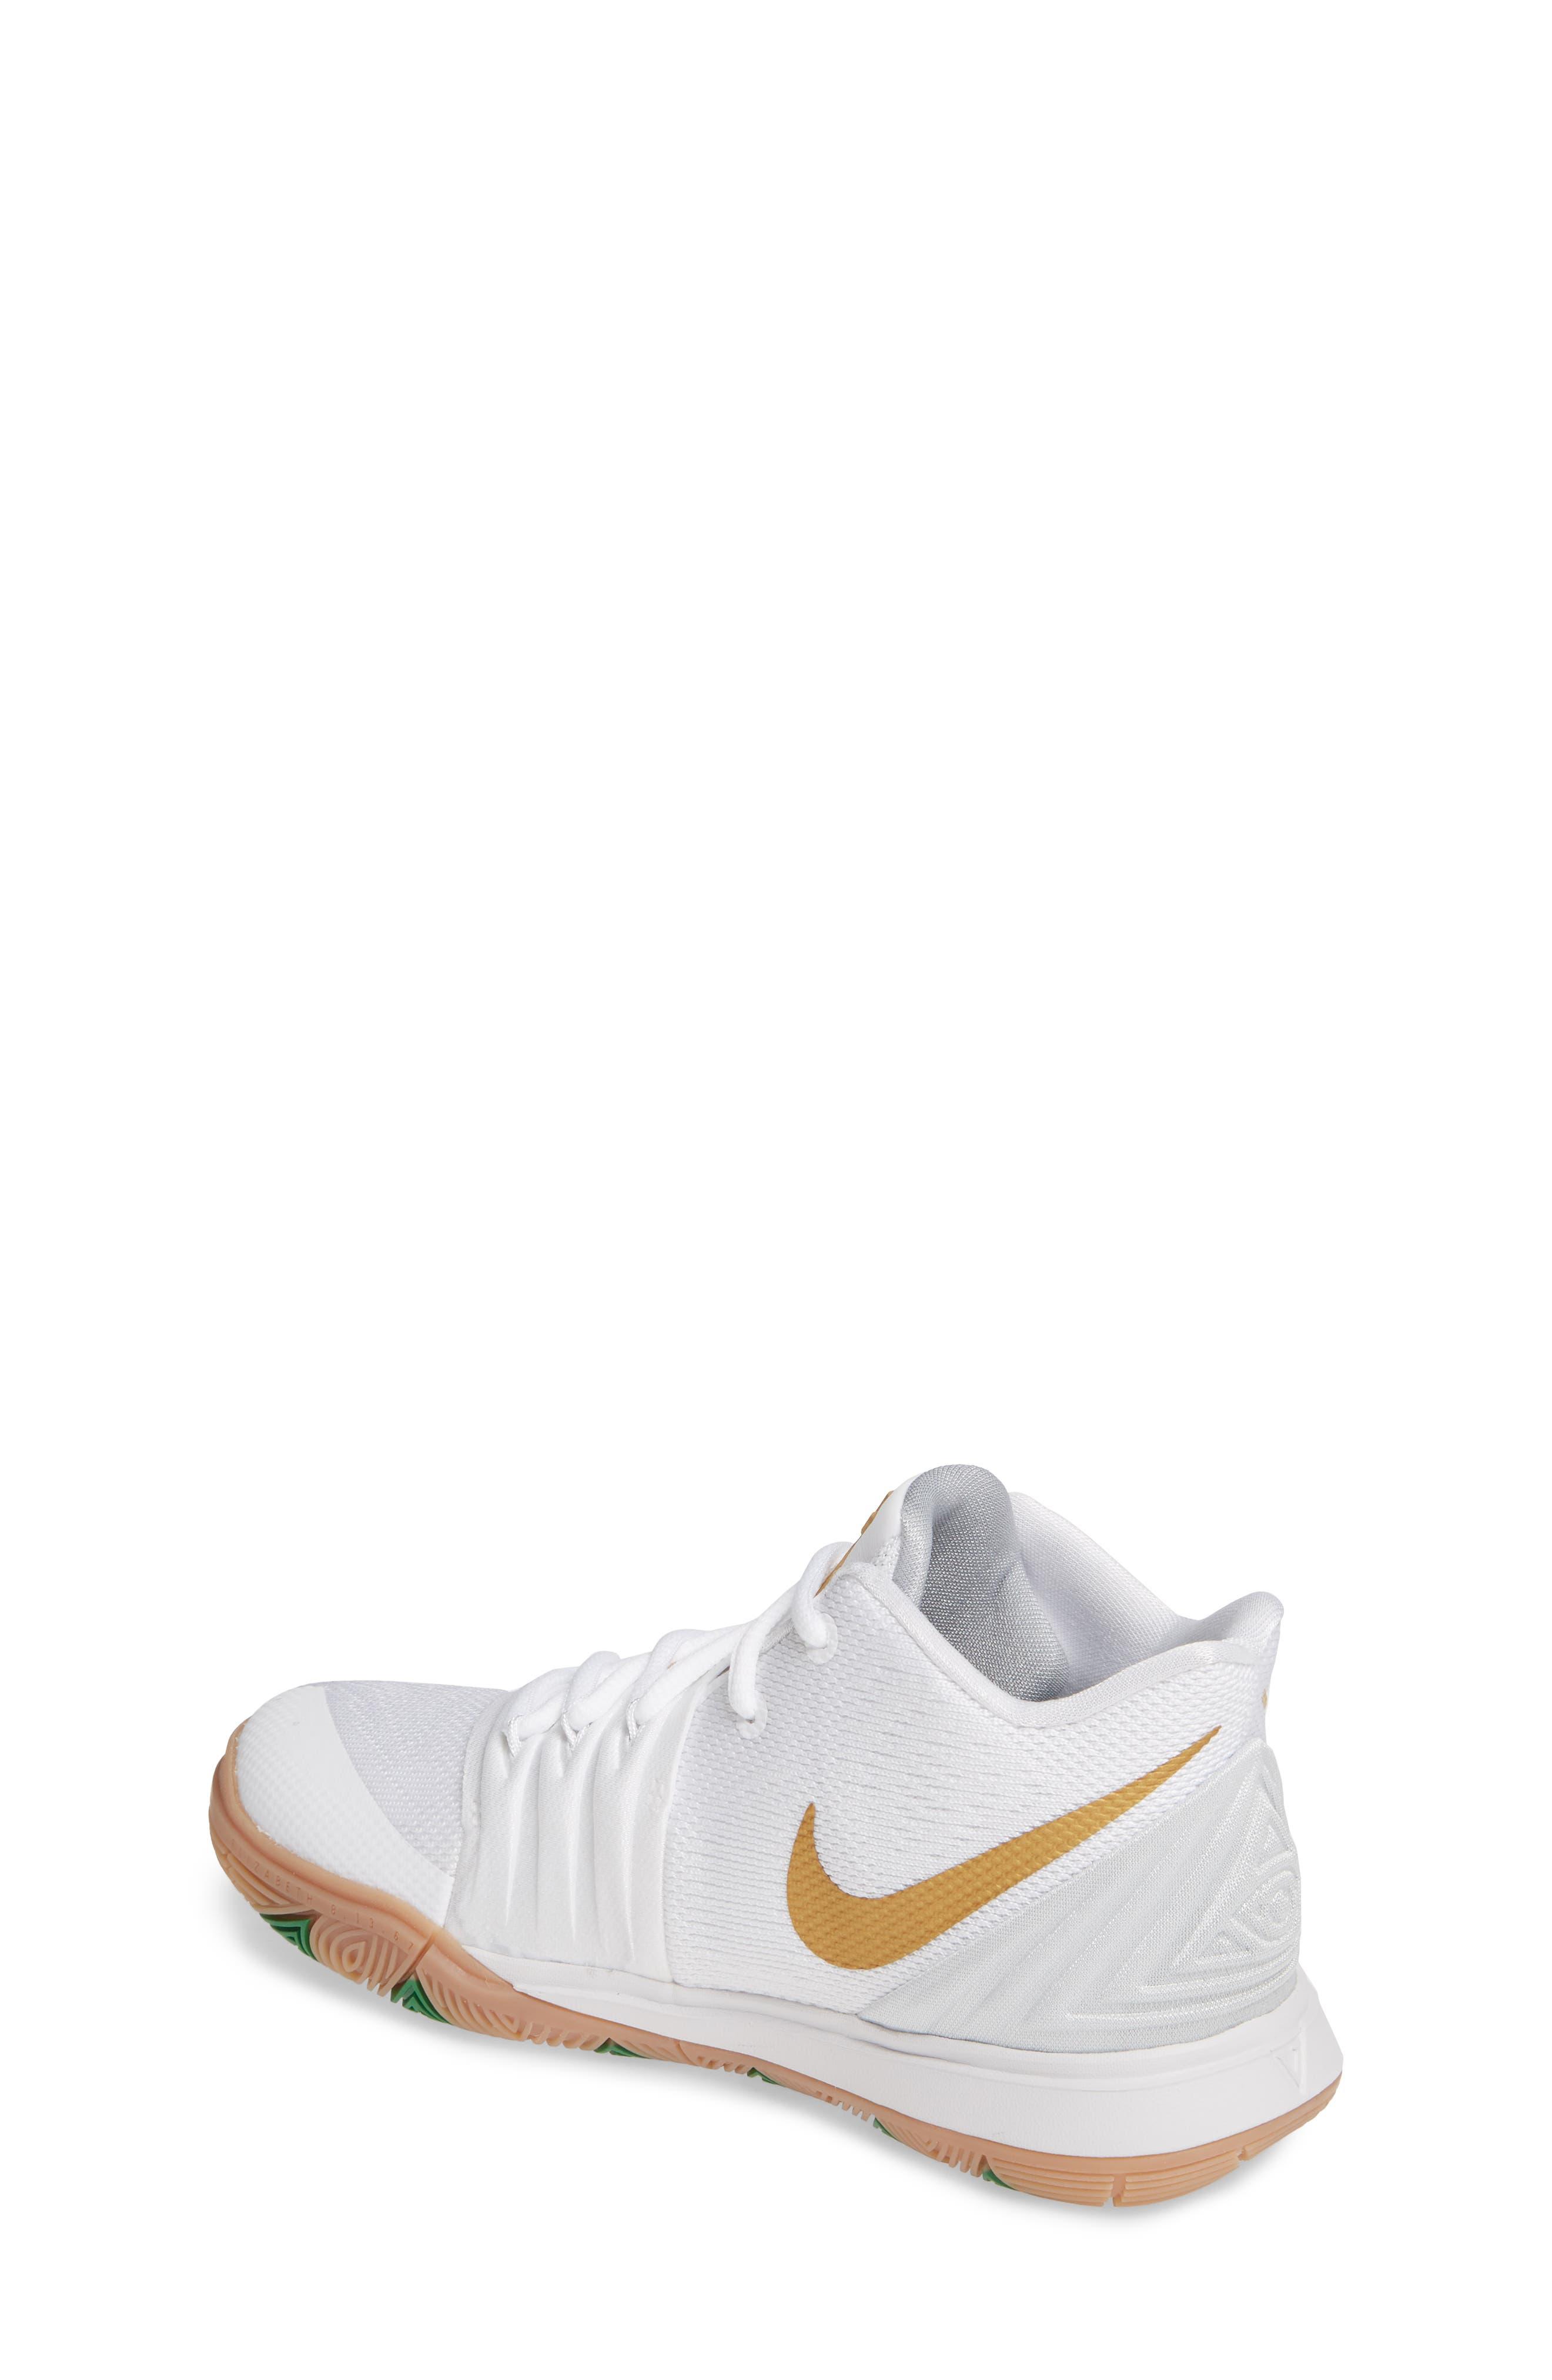 NIKE, Kyrie 5 Basketball Shoe, Alternate thumbnail 2, color, WHITE/ METALLIC GOLD-PLATINUM